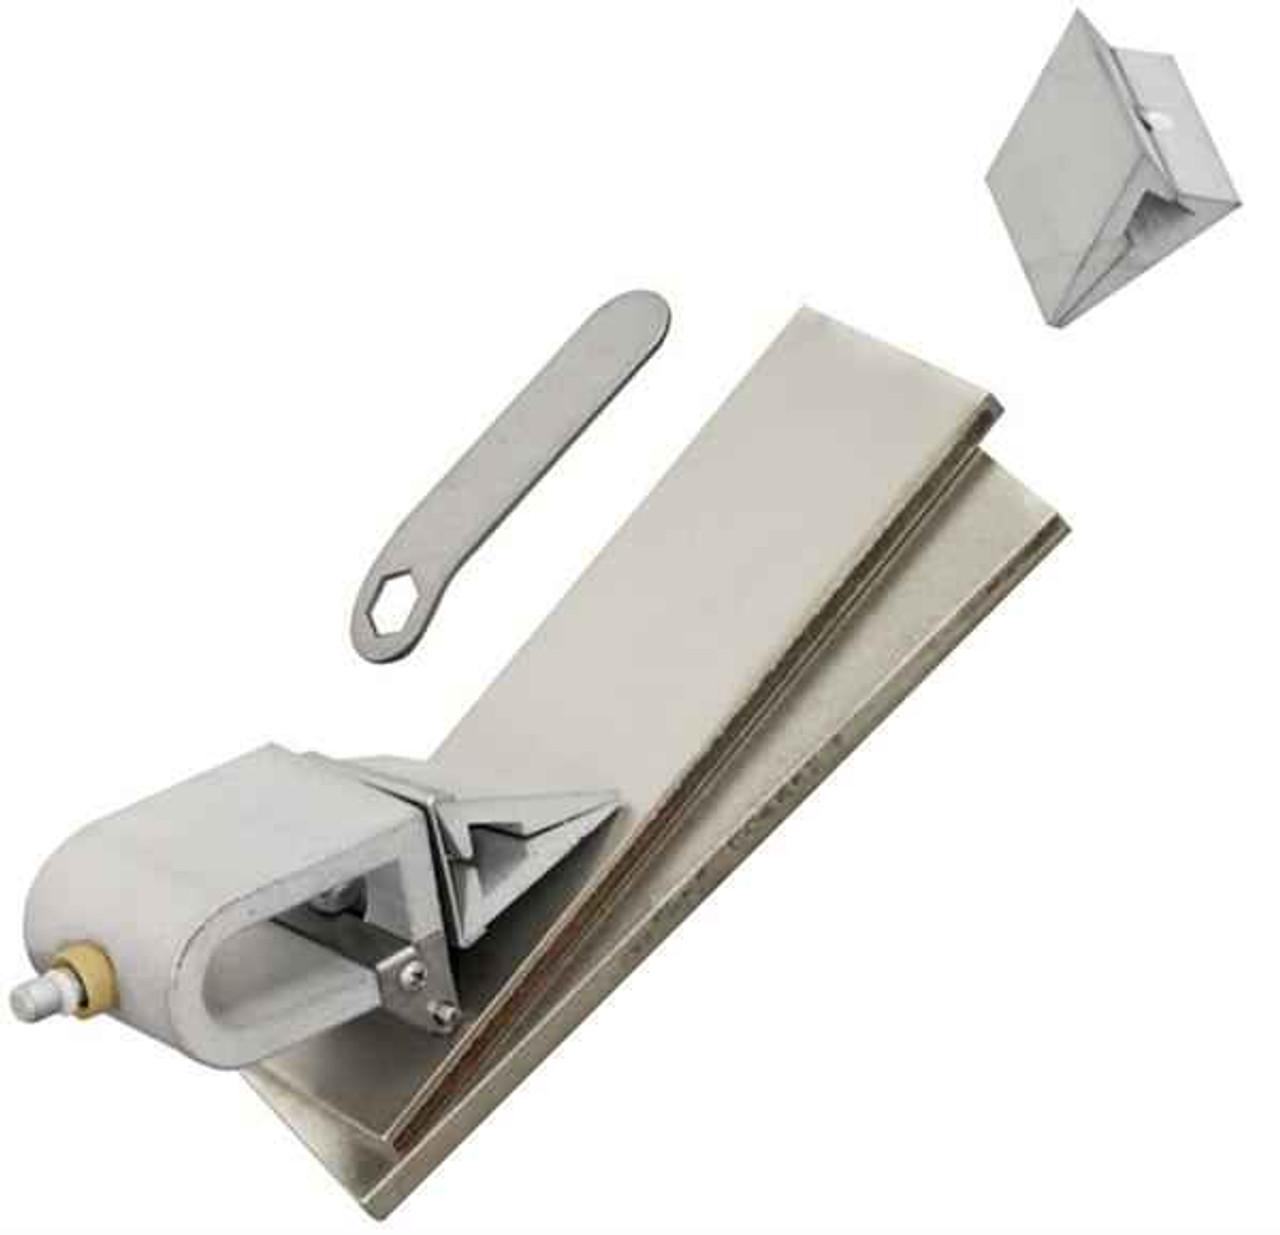 KME Self-Aligning Broadhead and Replacement Blade Sharpener - Diamond Stone Kit.